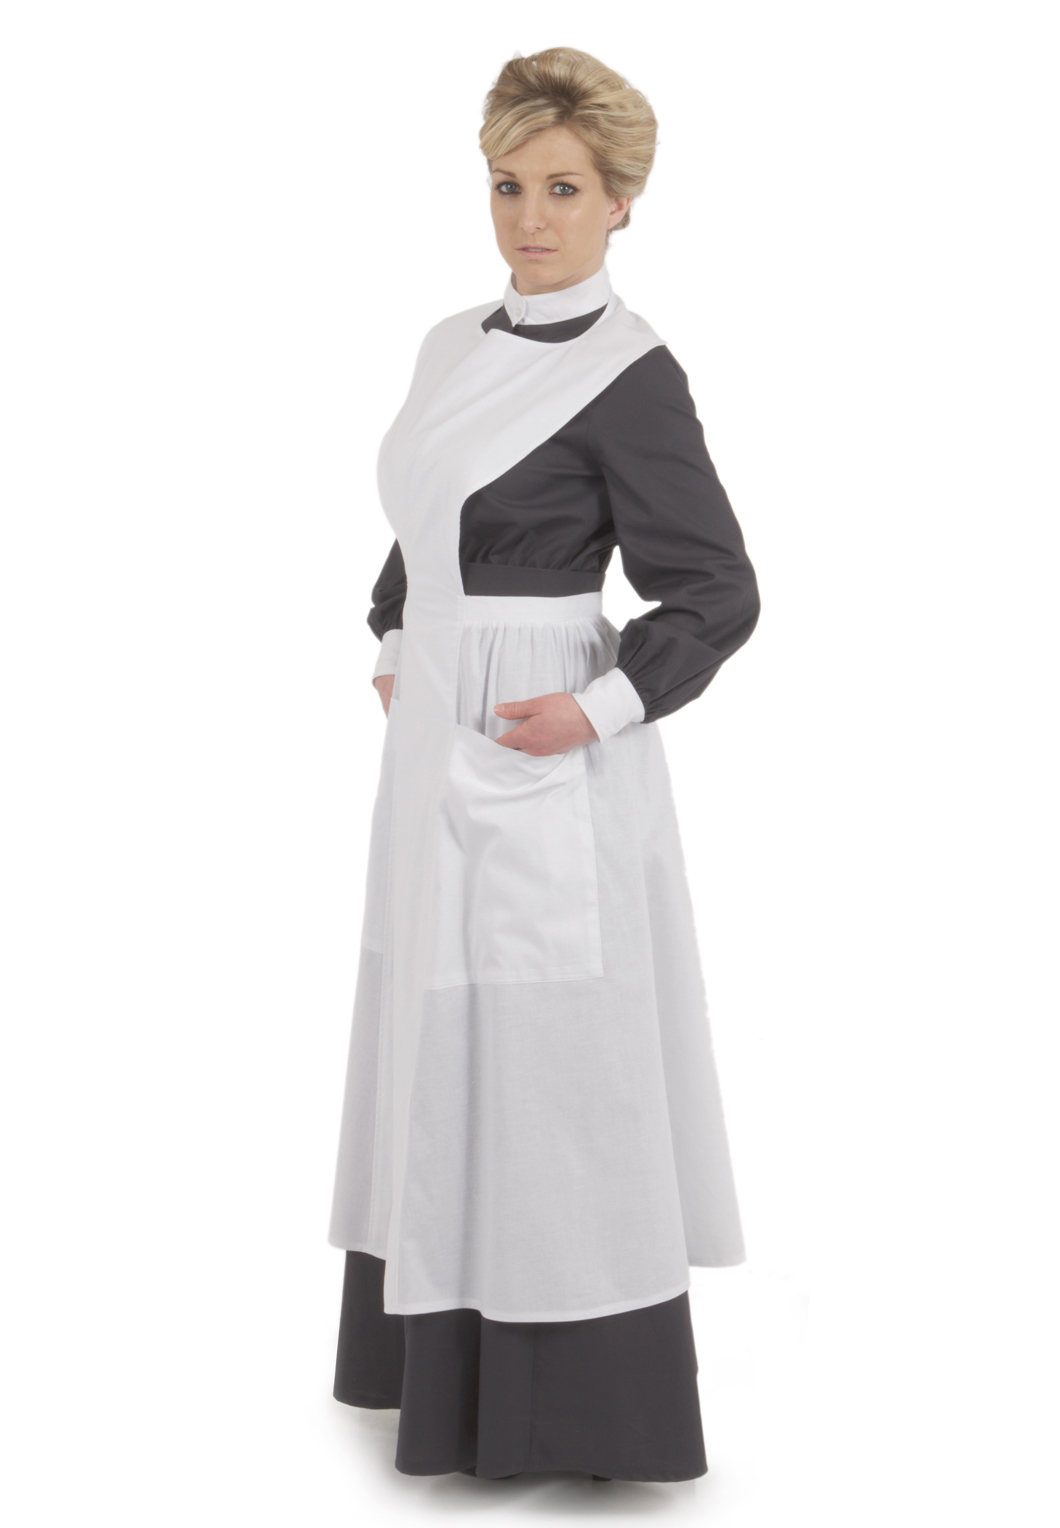 Edwardian white apron - Hallie Edwardian Apron